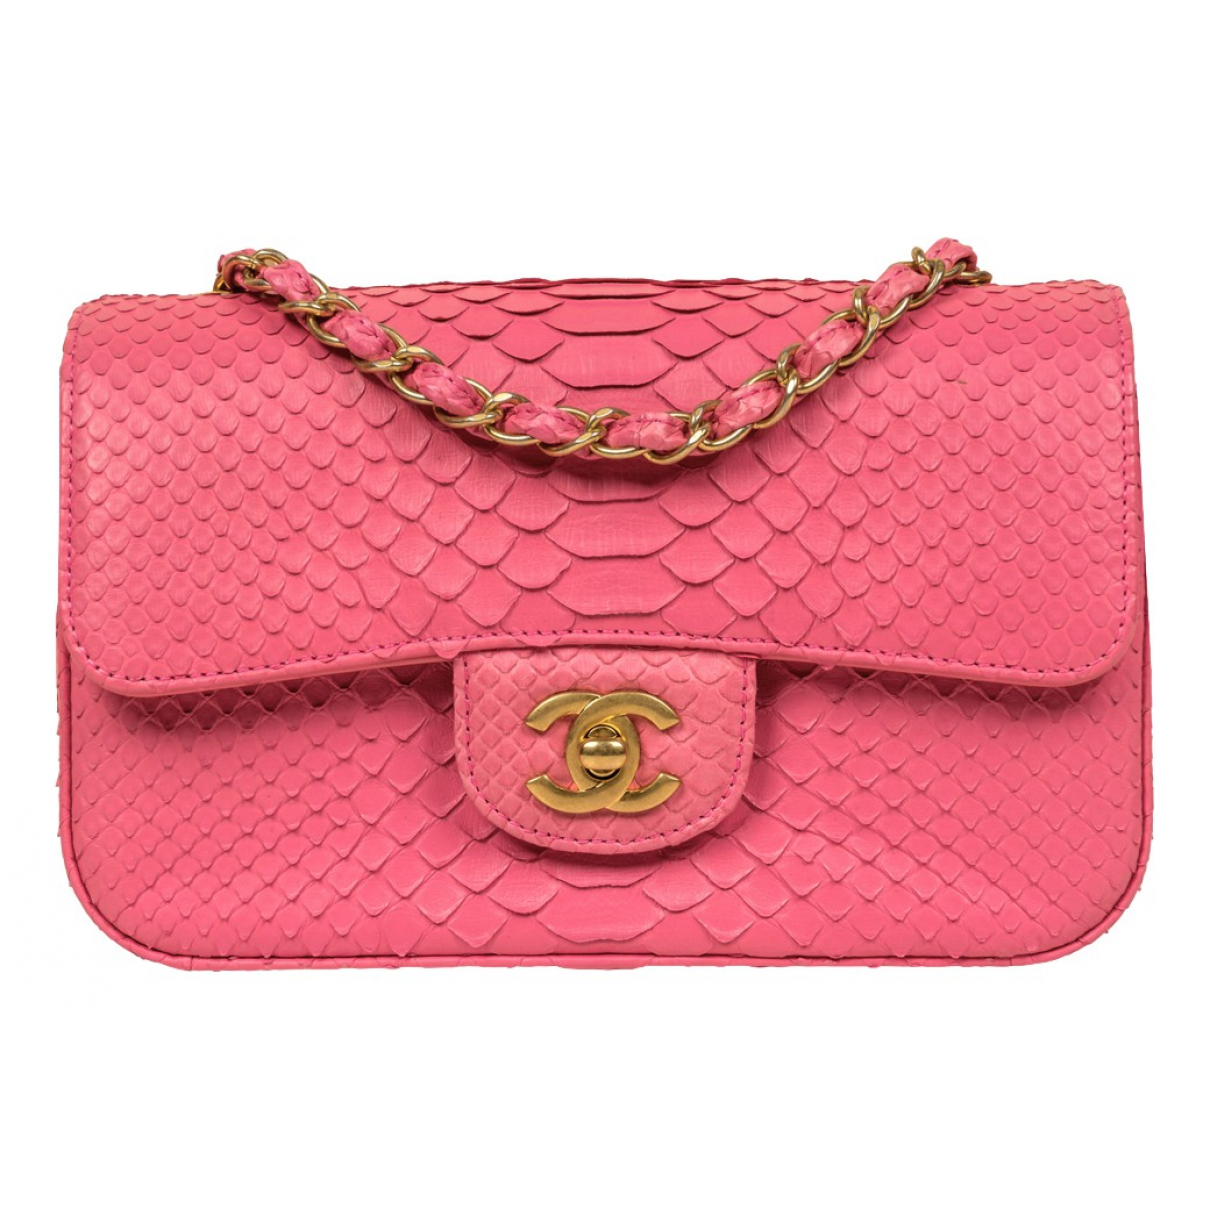 Chanel Timeless/Classique Pink Python handbag for Women N